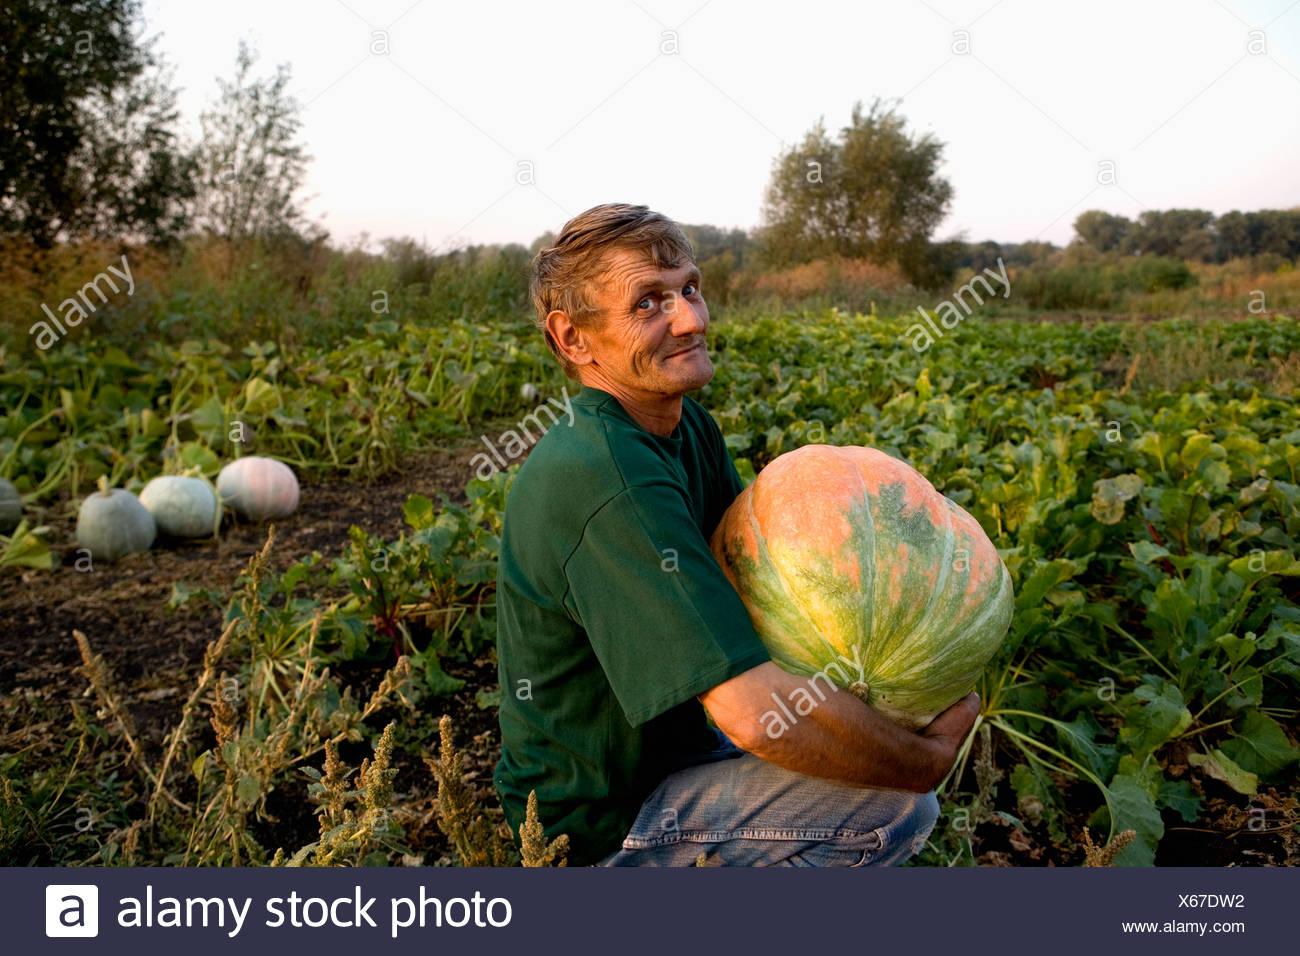 portrait of peasant sitting in garden holding pumpkin - Stock Image